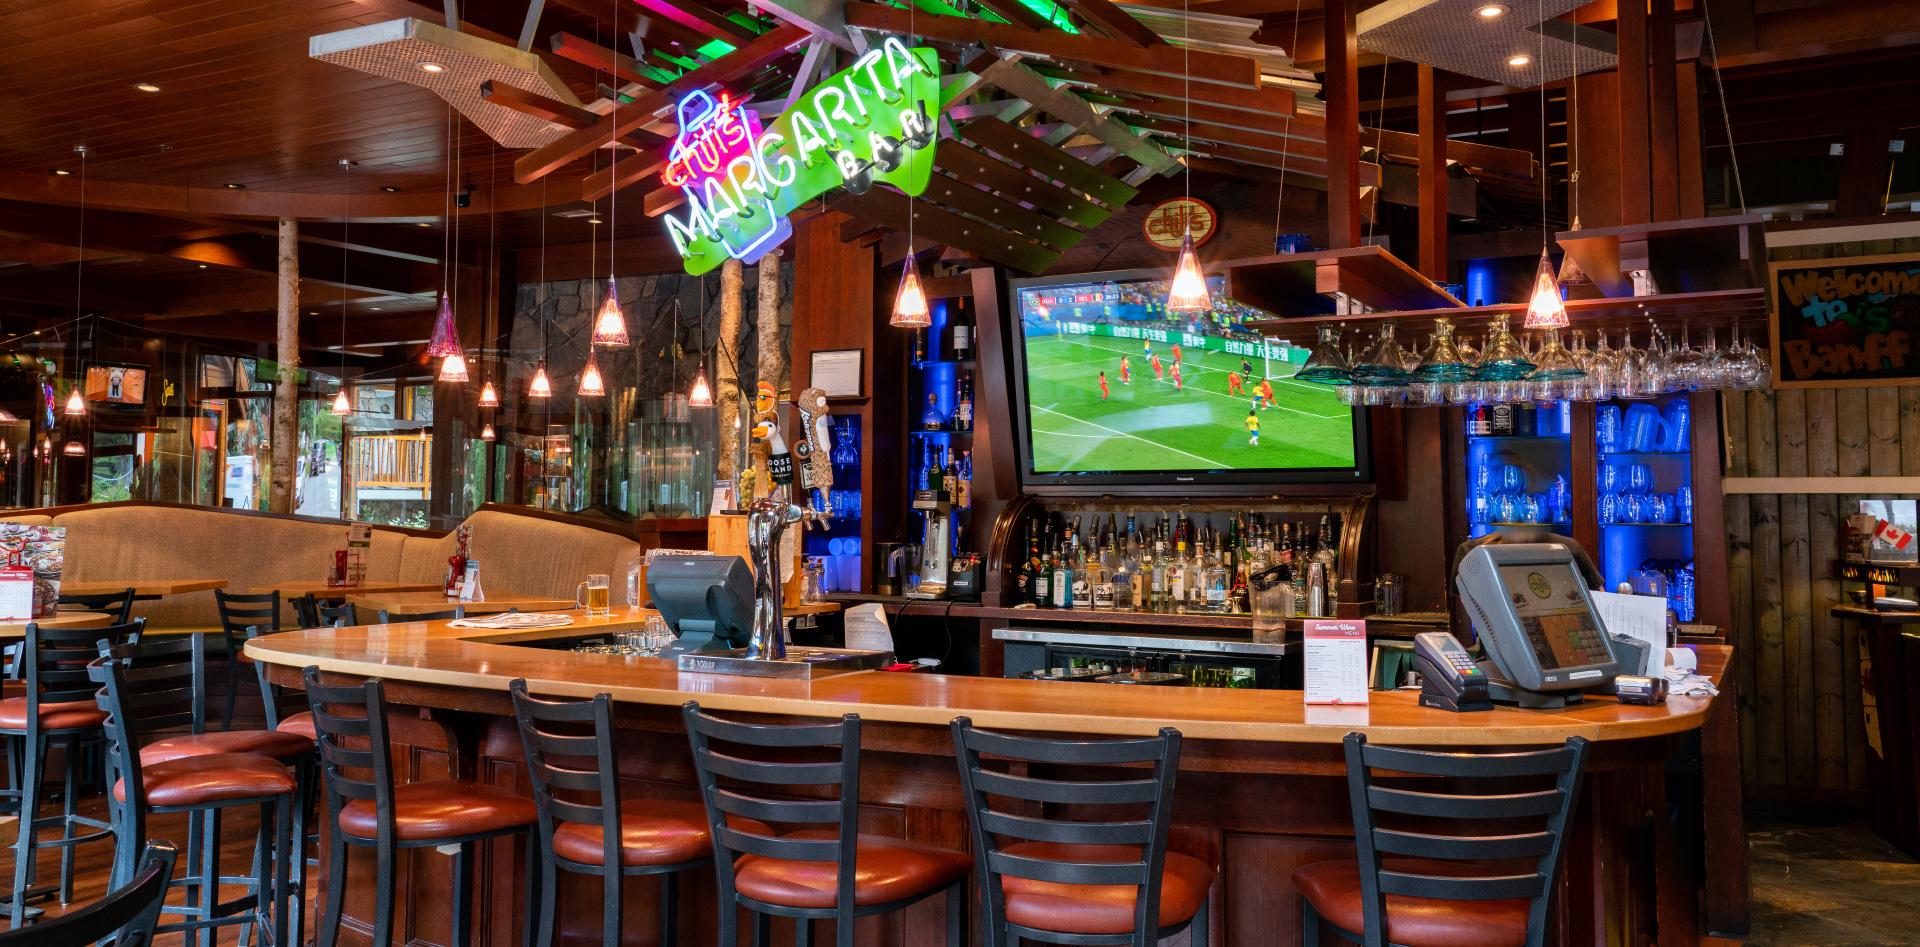 Chilis Restaurant and Bar